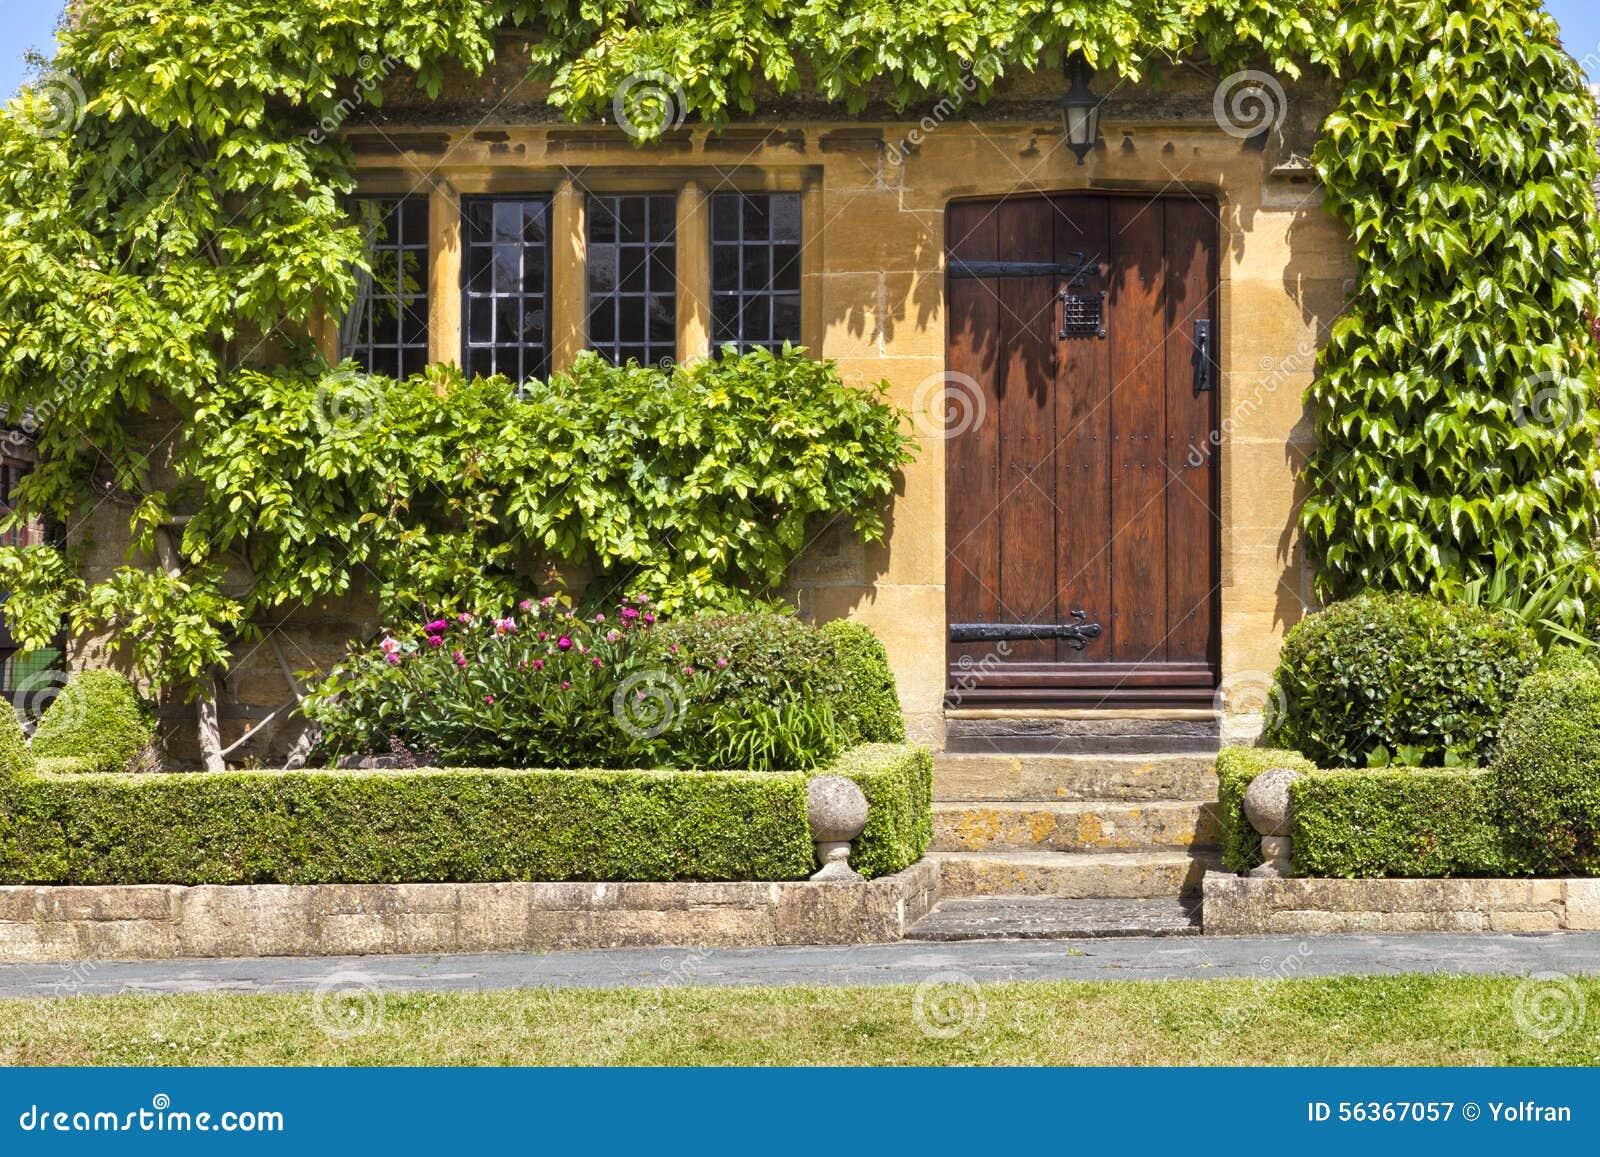 9f789d2737c9 Καφετιές ξύλινες πόρτες στο παραδοσιακό αγγλικό λιθοστρωμένο εξοχικό ...